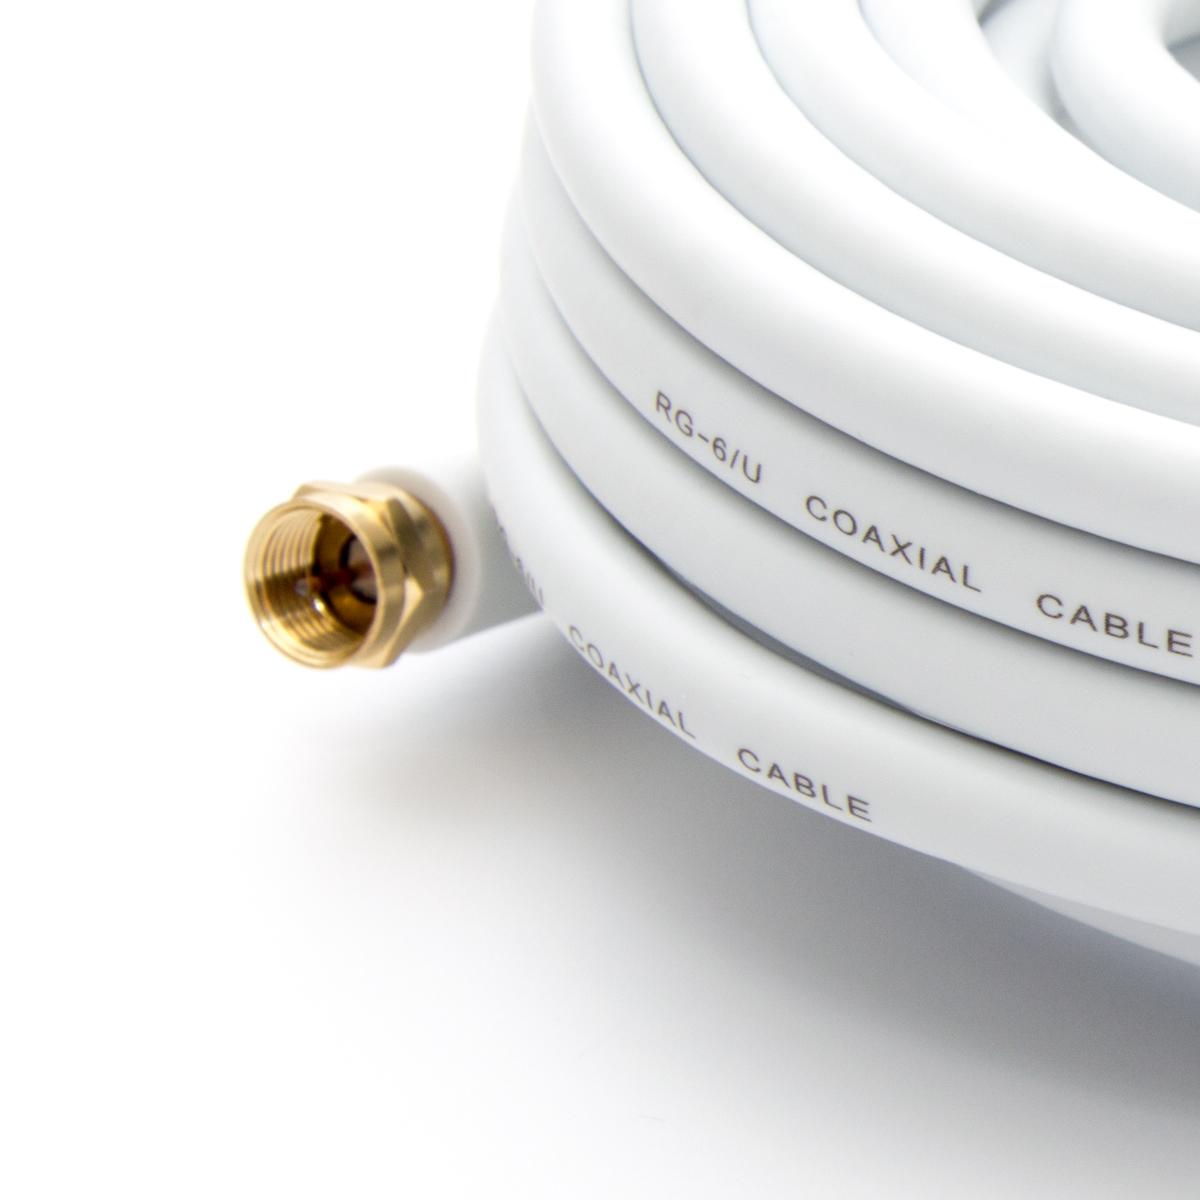 7,5m PremiumX HDTV Sat Antennenkabel Koax Kabel vergoldet 75 Ohm Koaxialkabel für Sat-Anlage DVB-S DVB-S2 DVB-T DVB-T2 mit Mantelstromfilter – 2x Ferritkern – Weiß